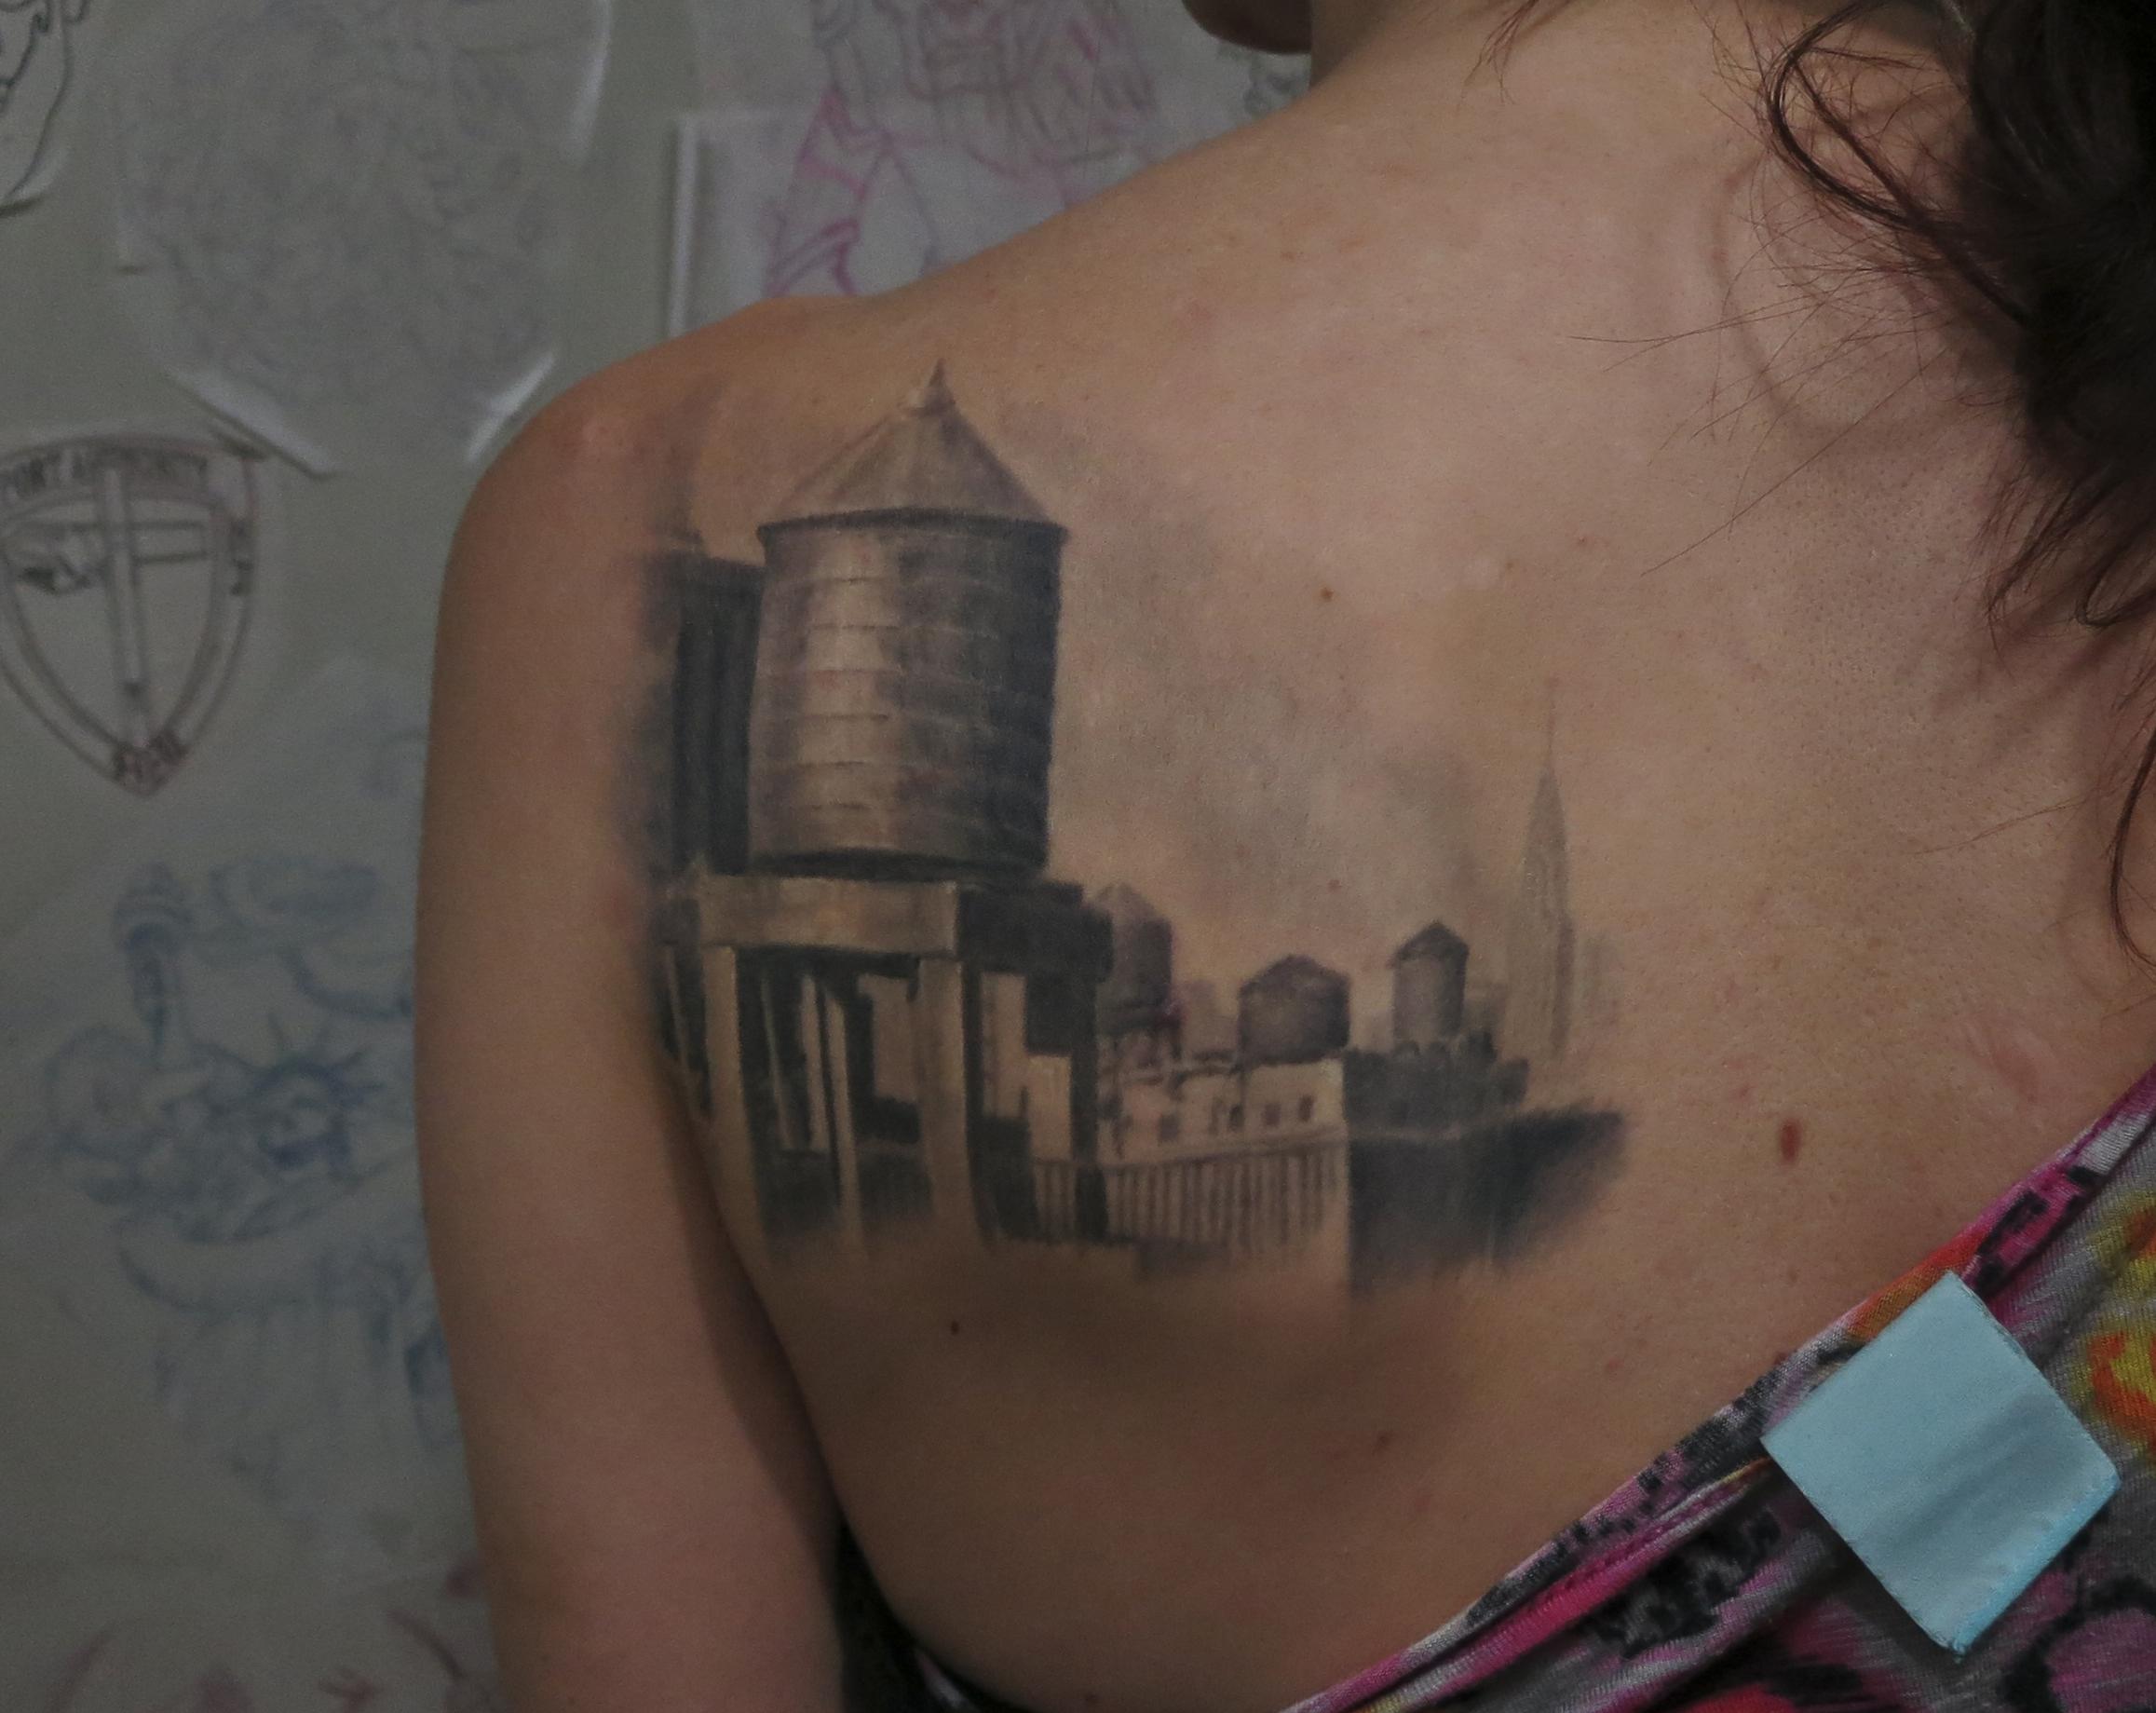 realisic_F_water_tower_tattoo.jpg